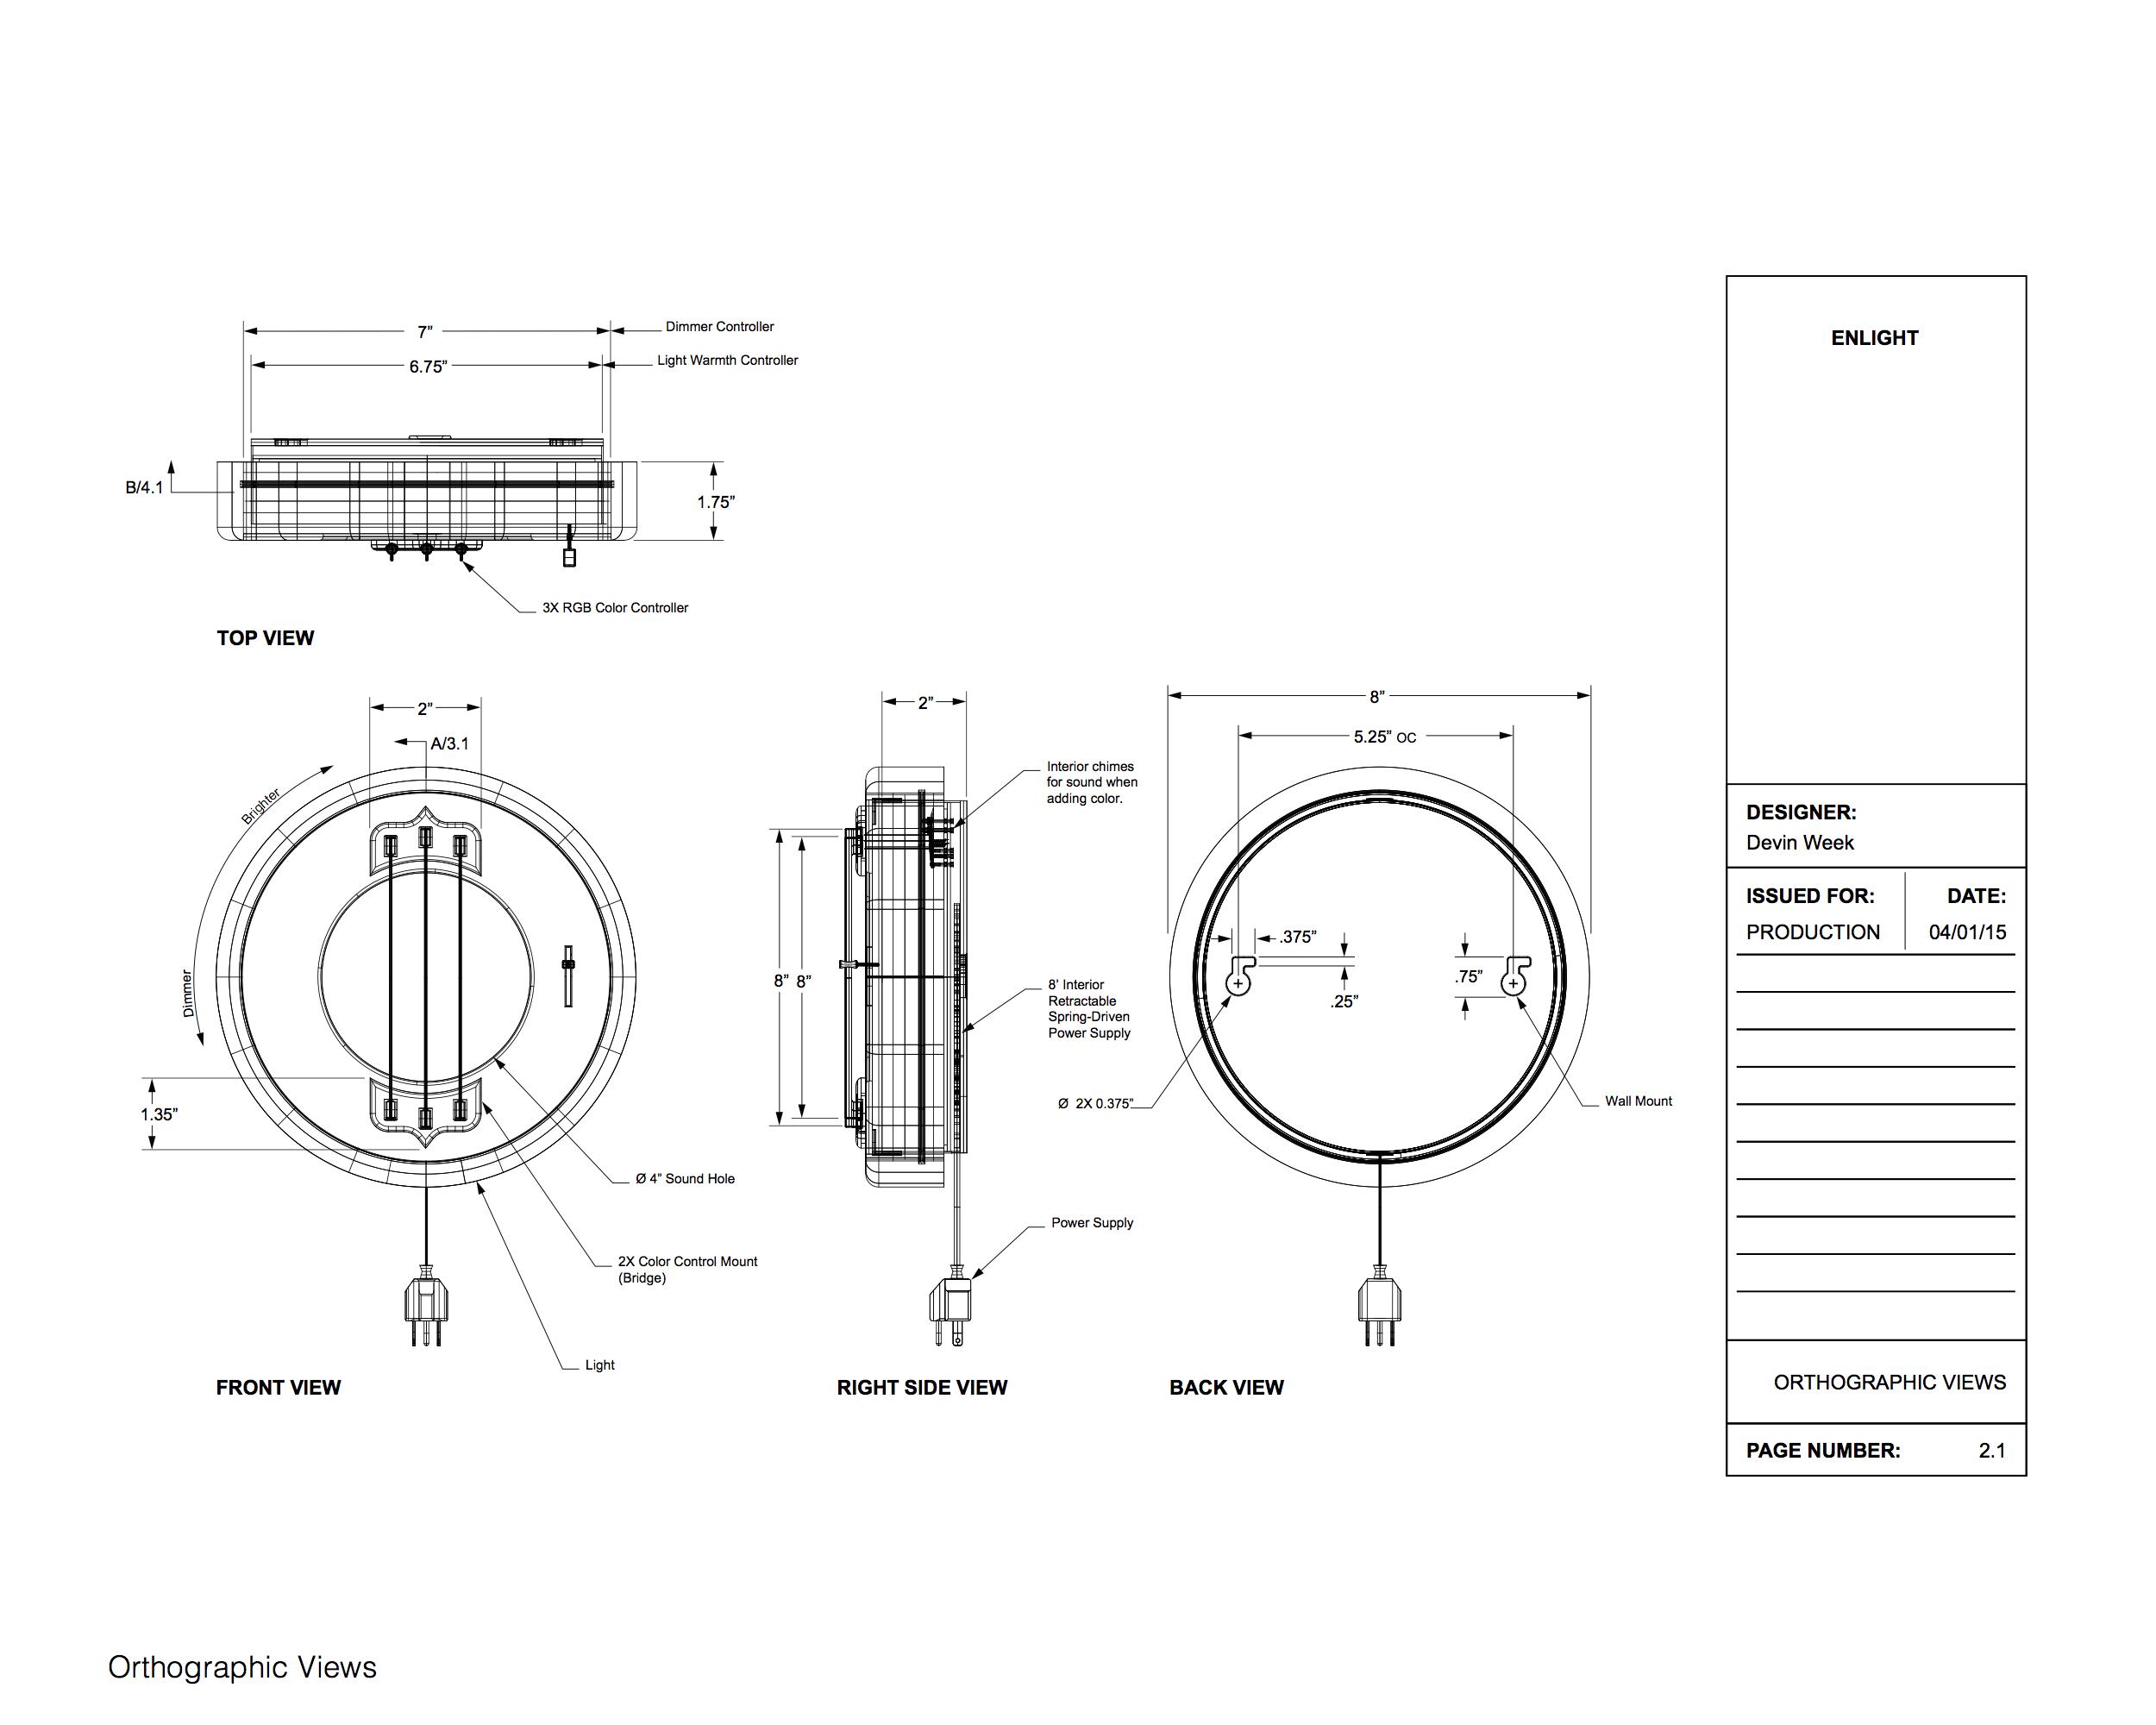 DesignPorfolio2016 (dragged) 8.png